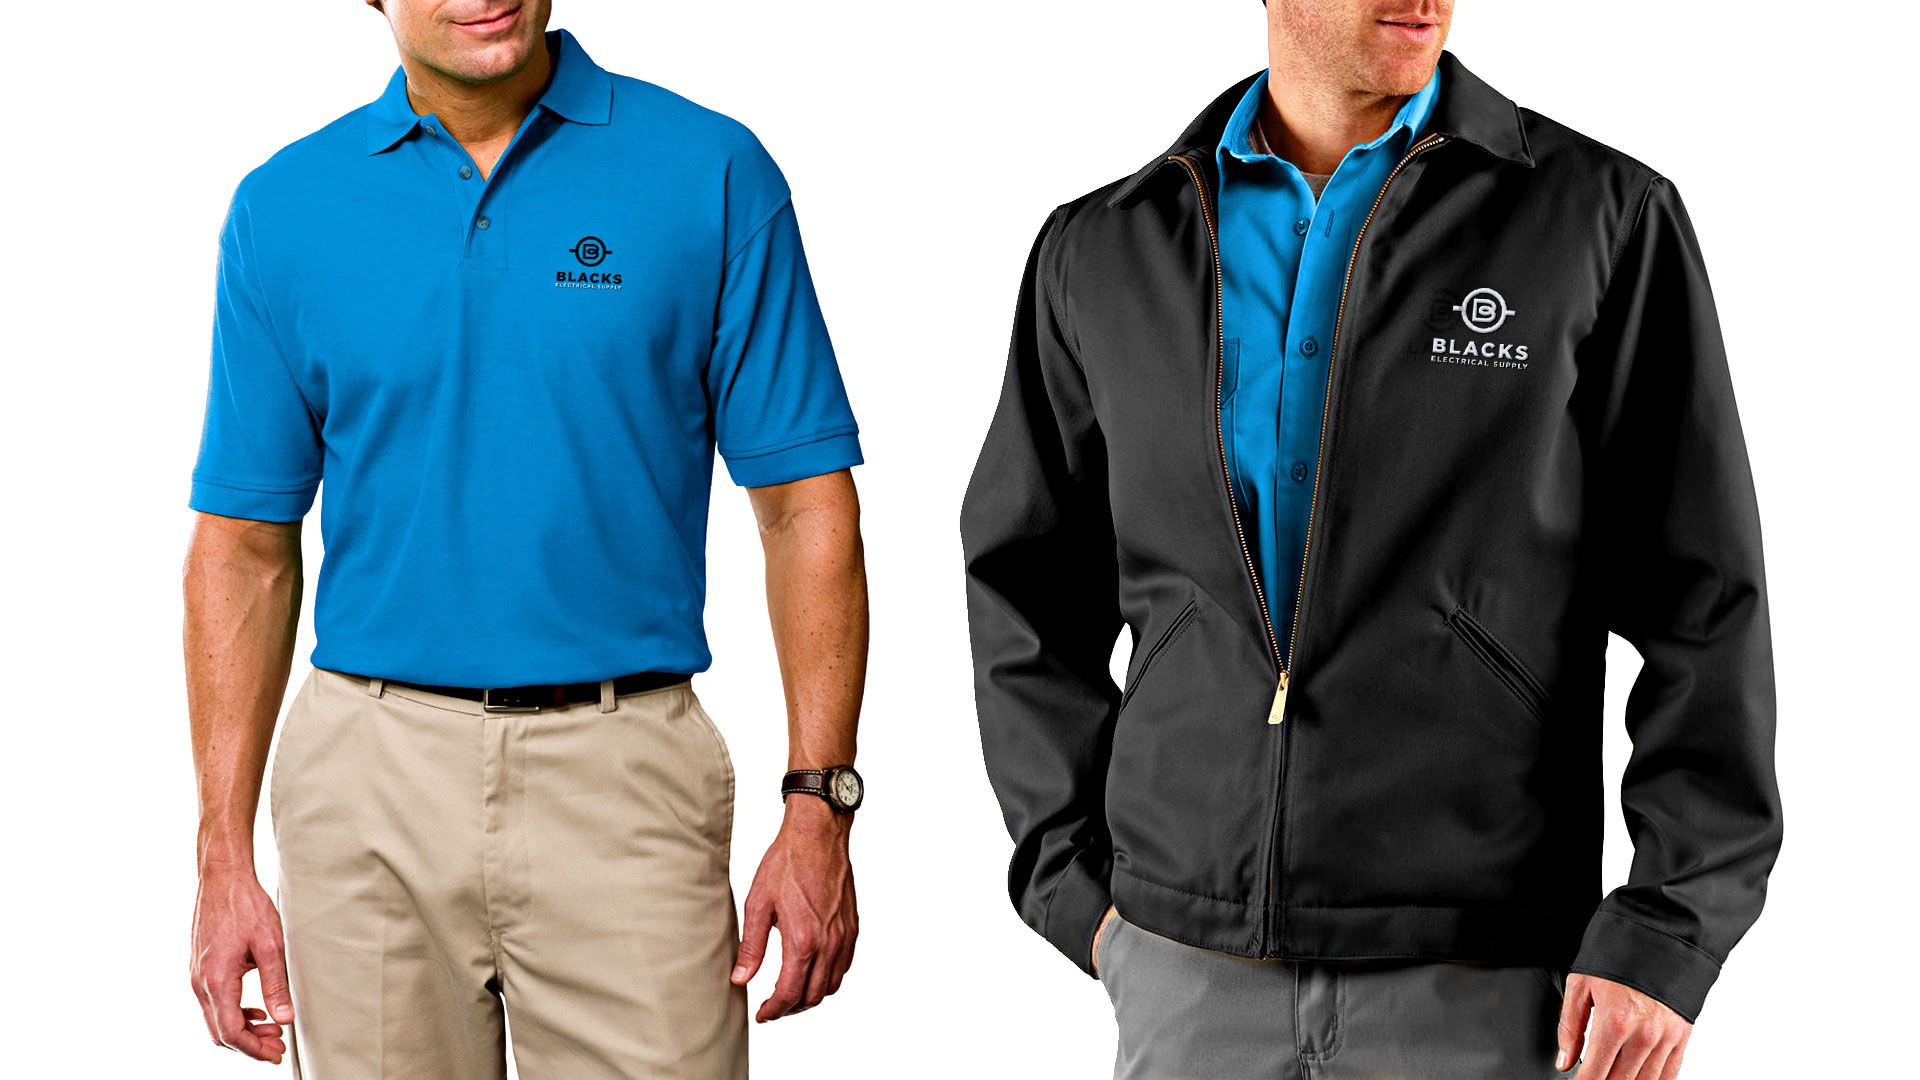 Branding Greenville-based Blacks Electrical Supply - - Branding Greenville Shirt and Jacket